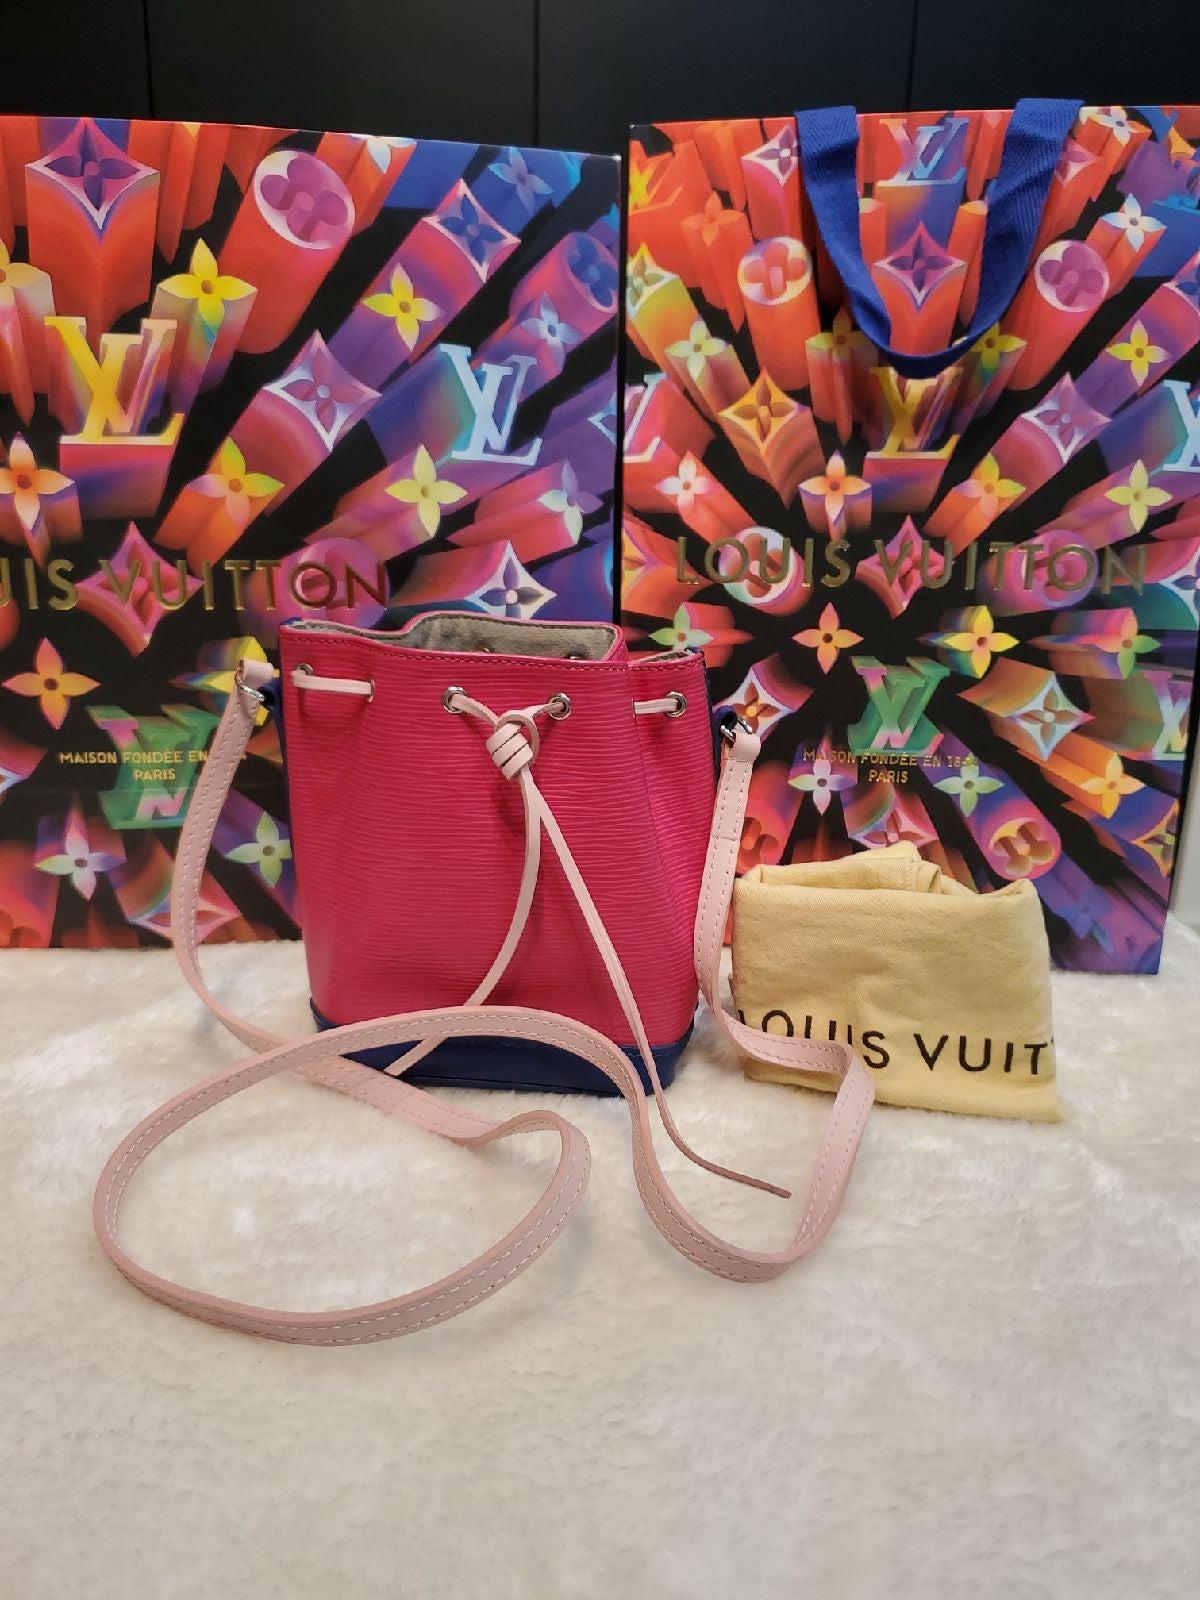 Louis Vuitton Noe Nano Pink Epi